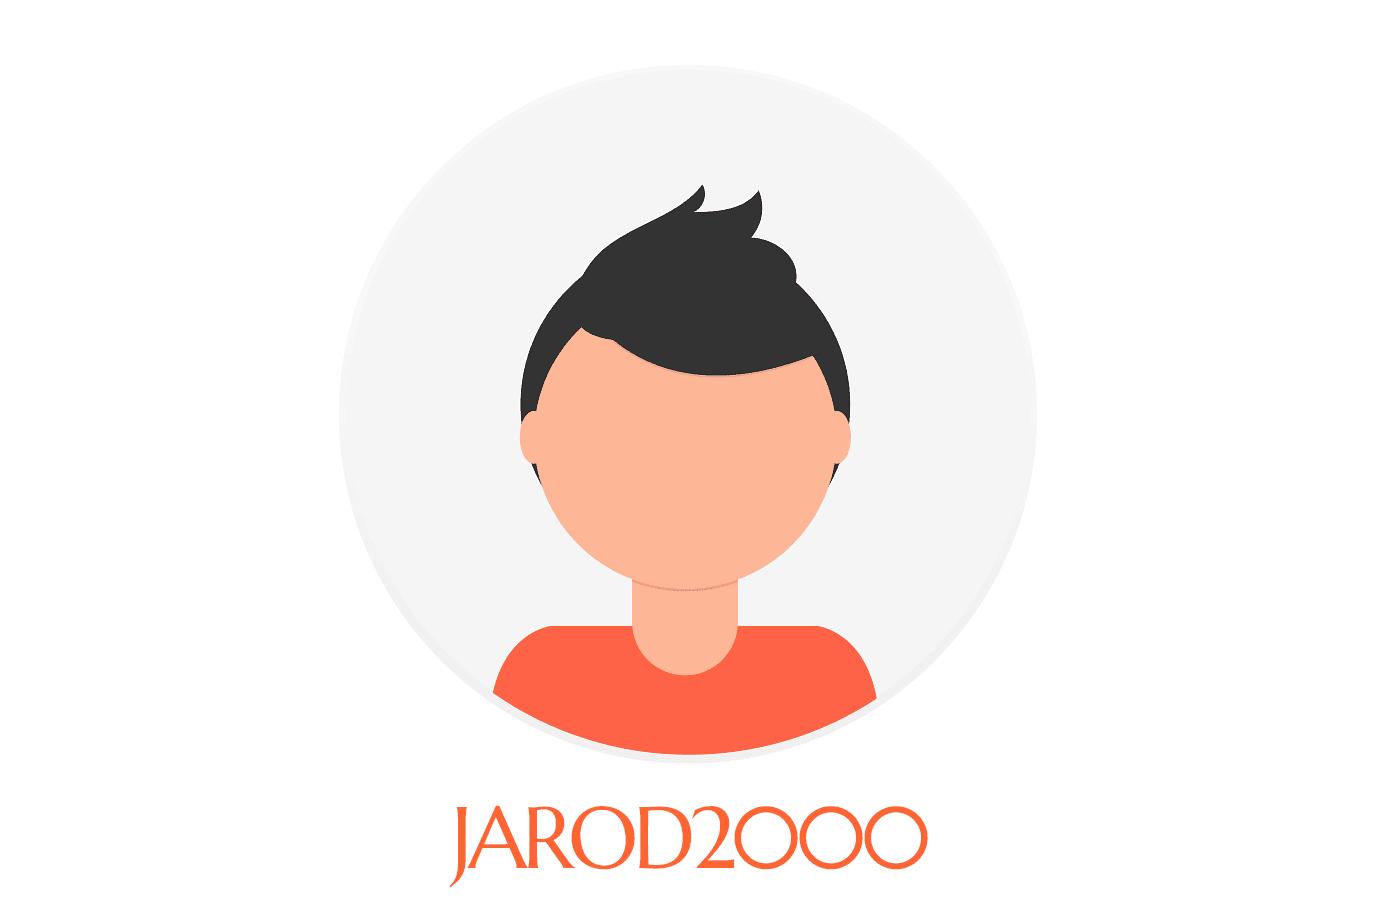 Avatar and username illustration